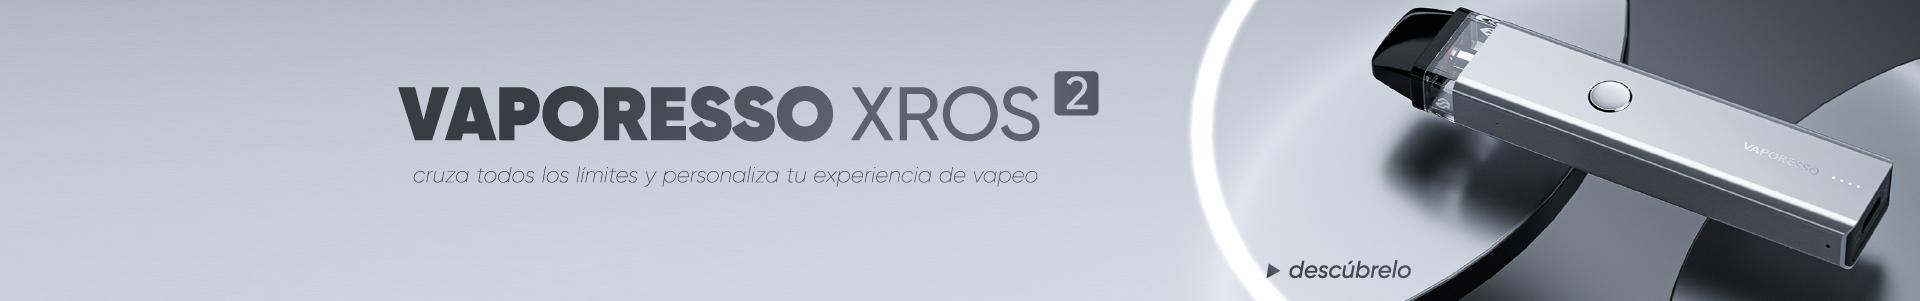 Nuevo Vaporesso Xros 2